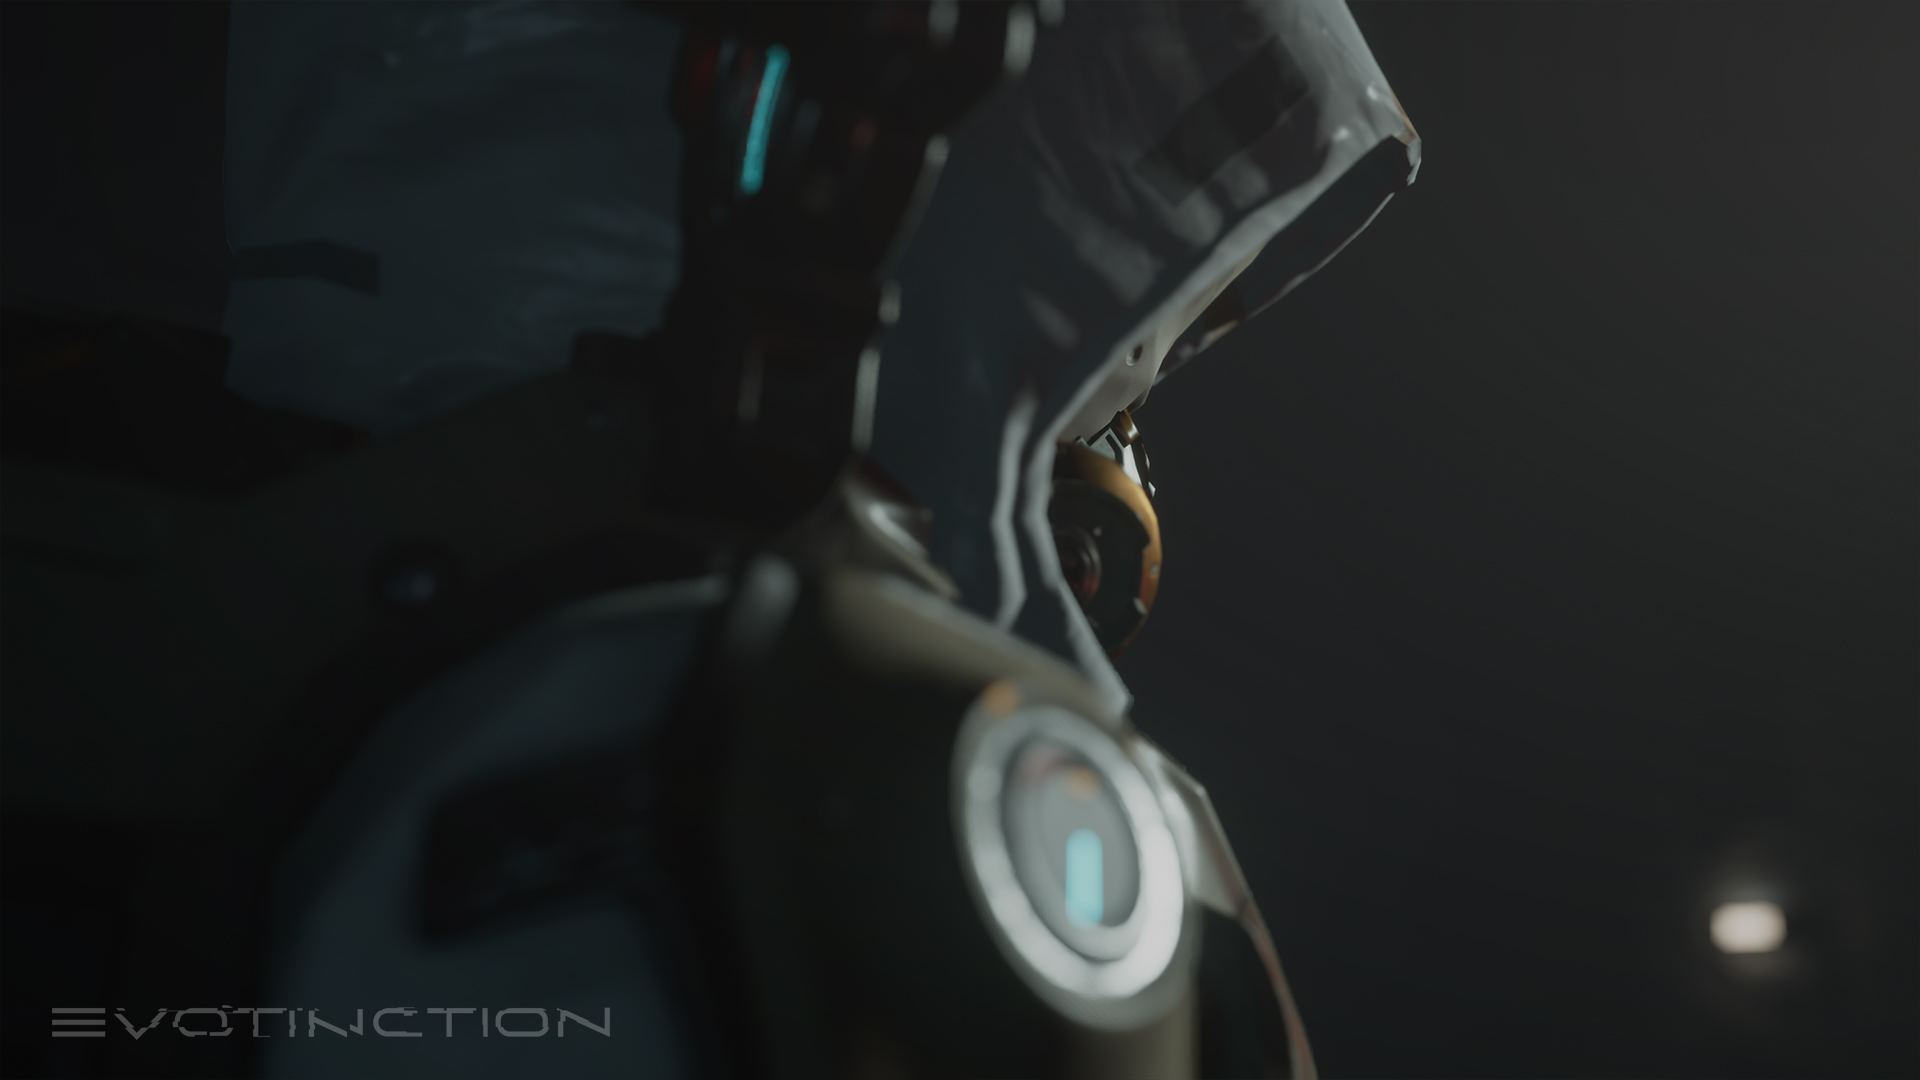 Evotinction (6)